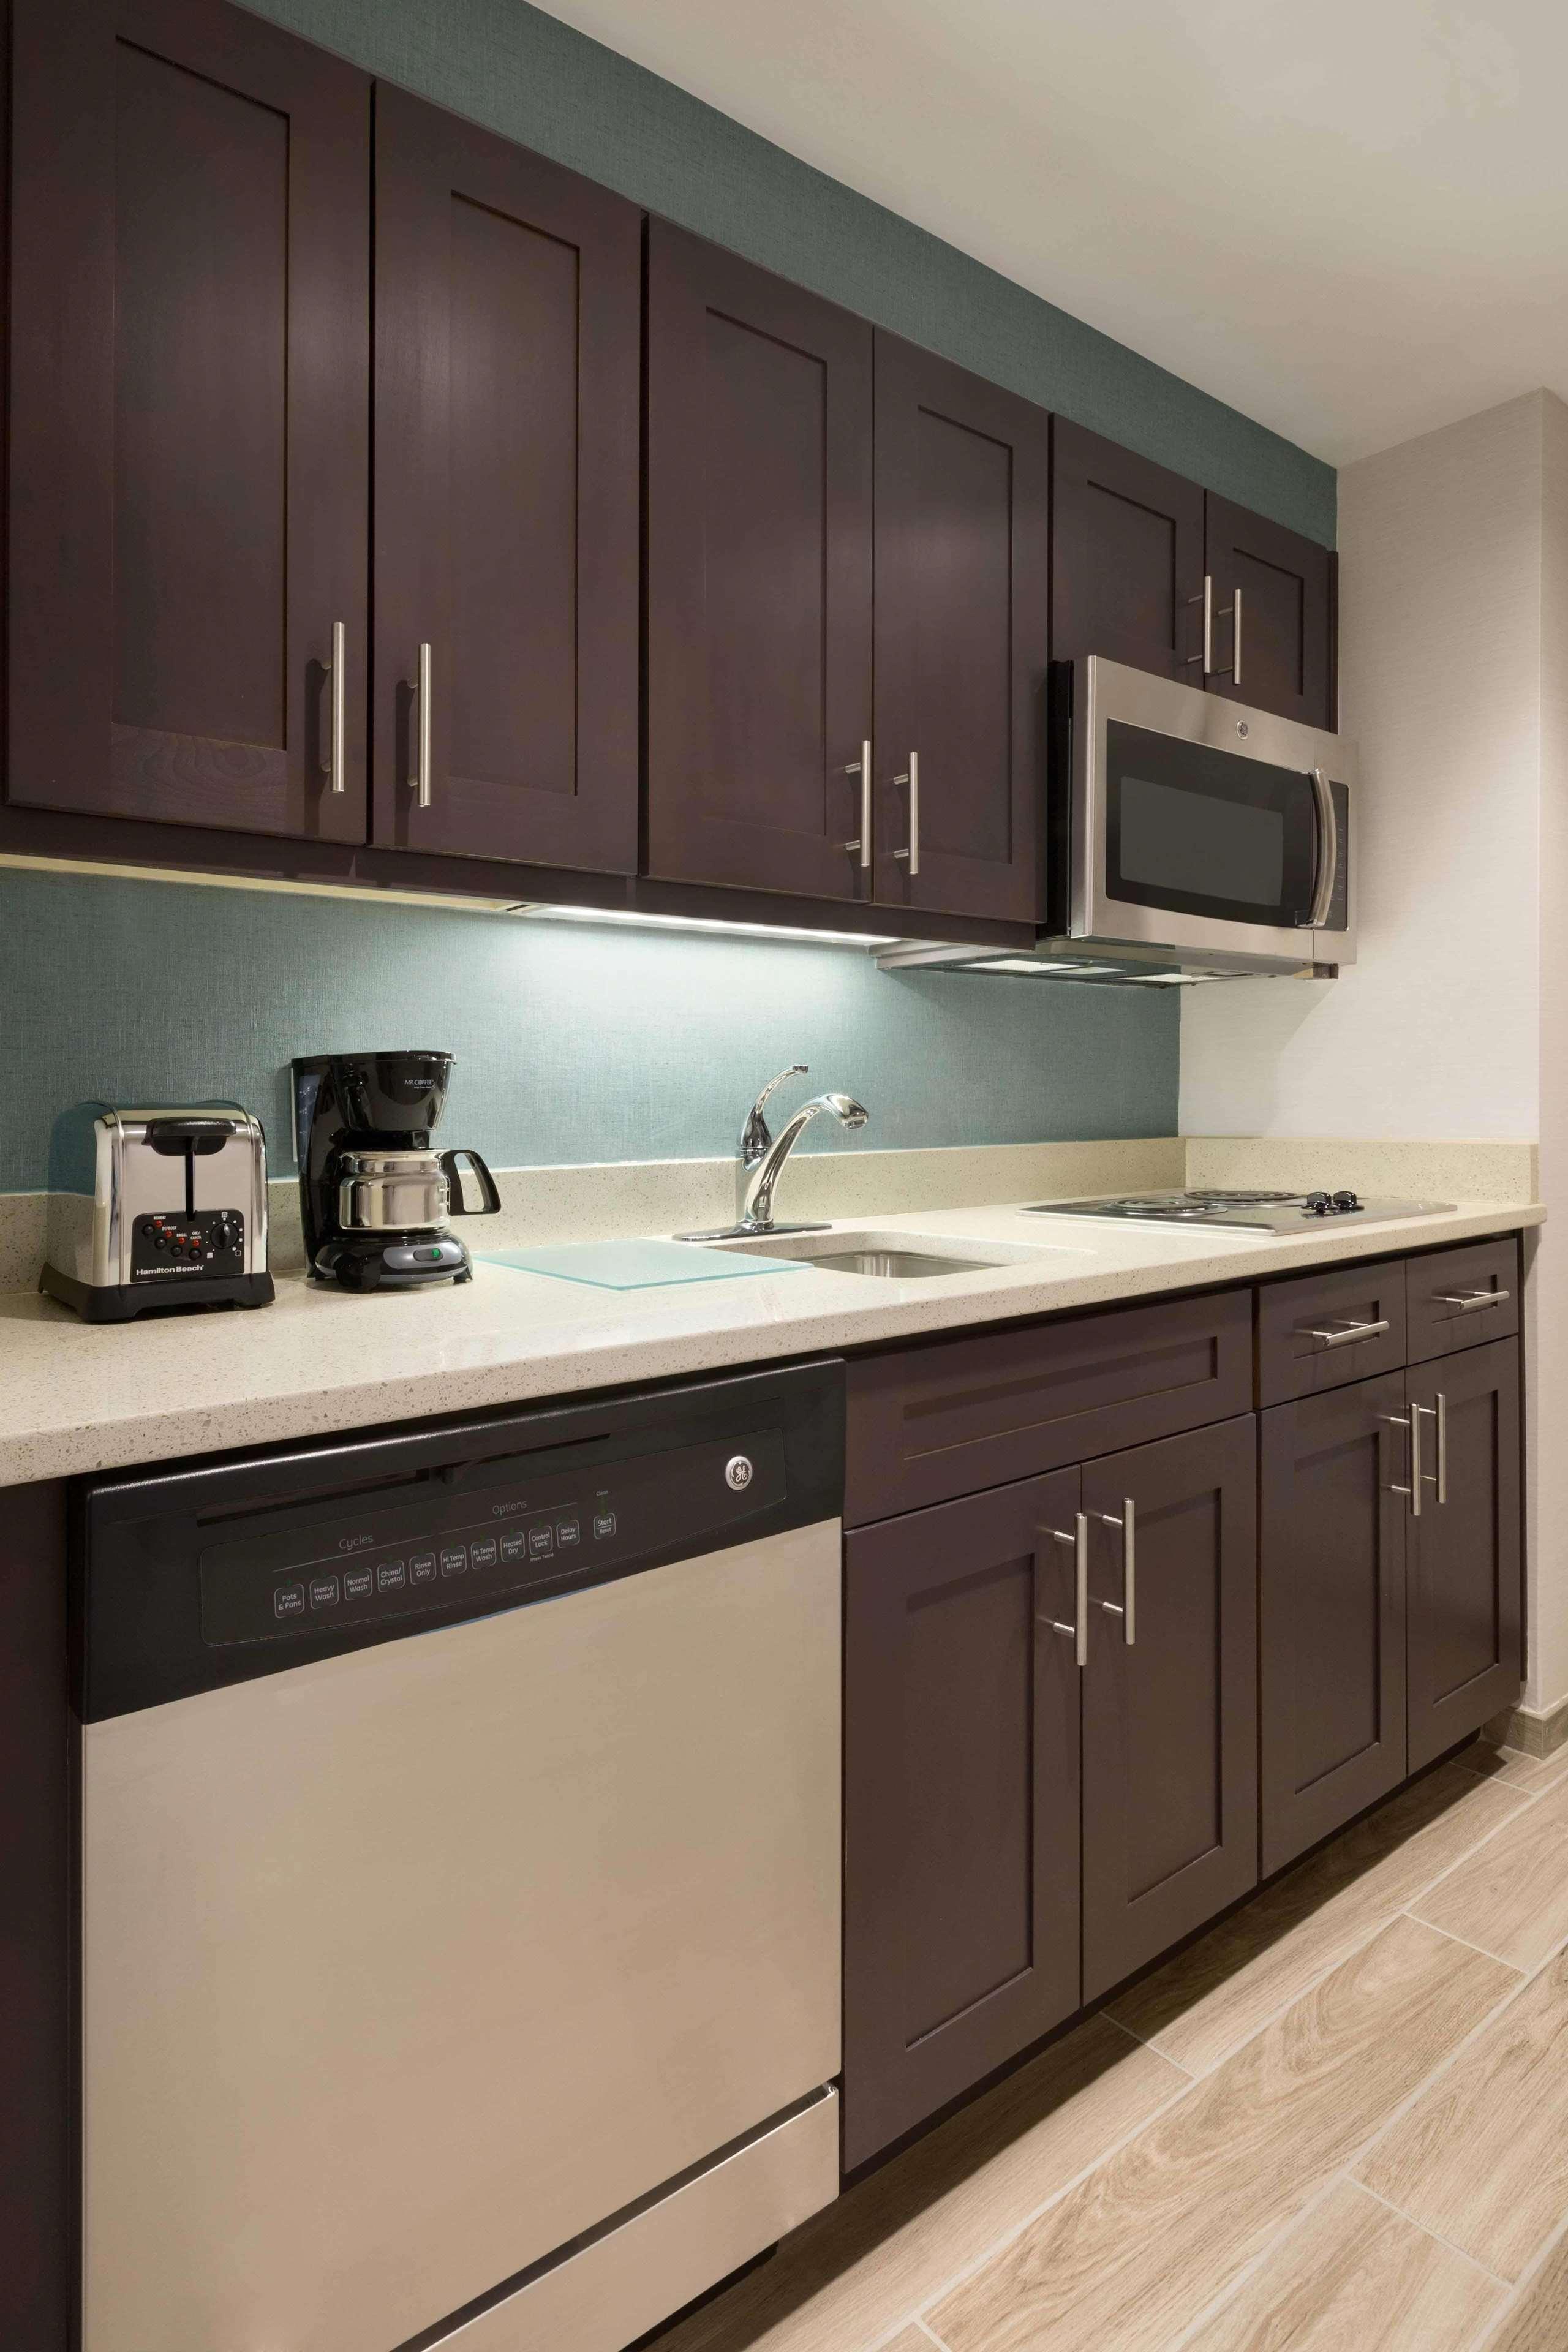 Homewood Suites by Hilton Washington DC Convention Center image 25